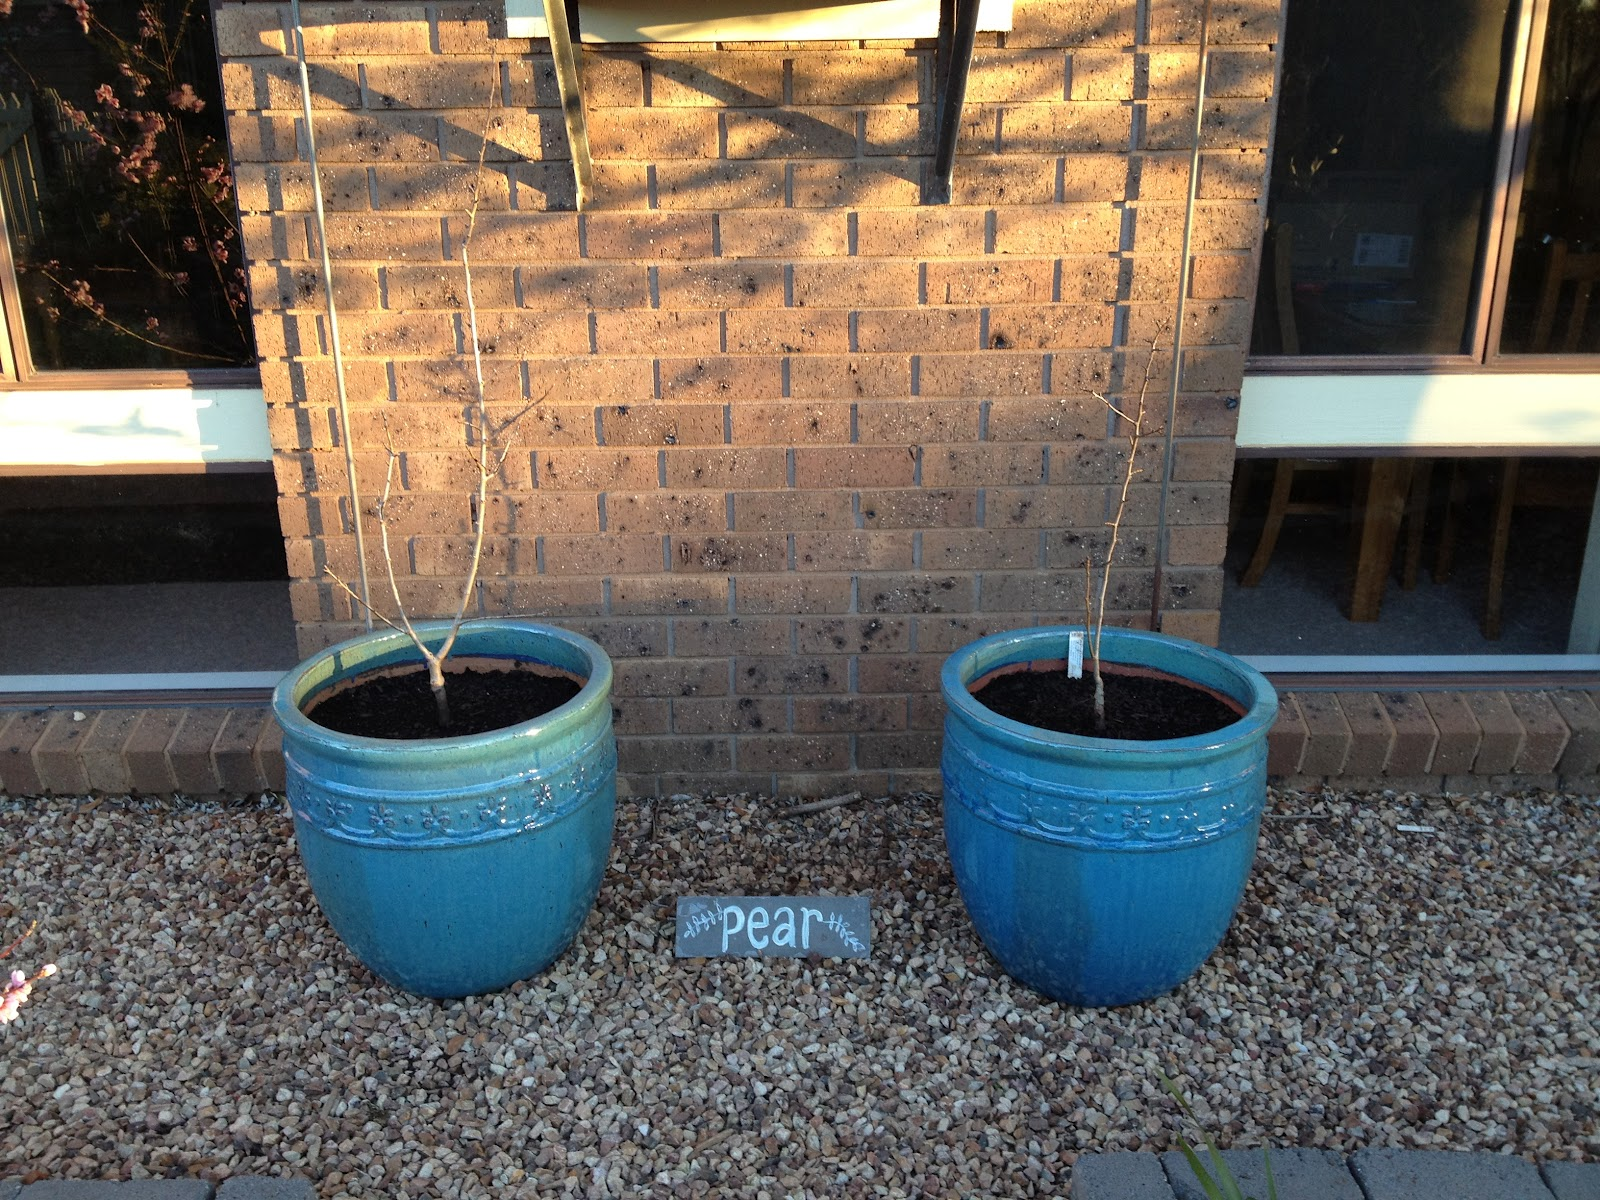 Spring Seedlings and Planting - The Greening of Gavin